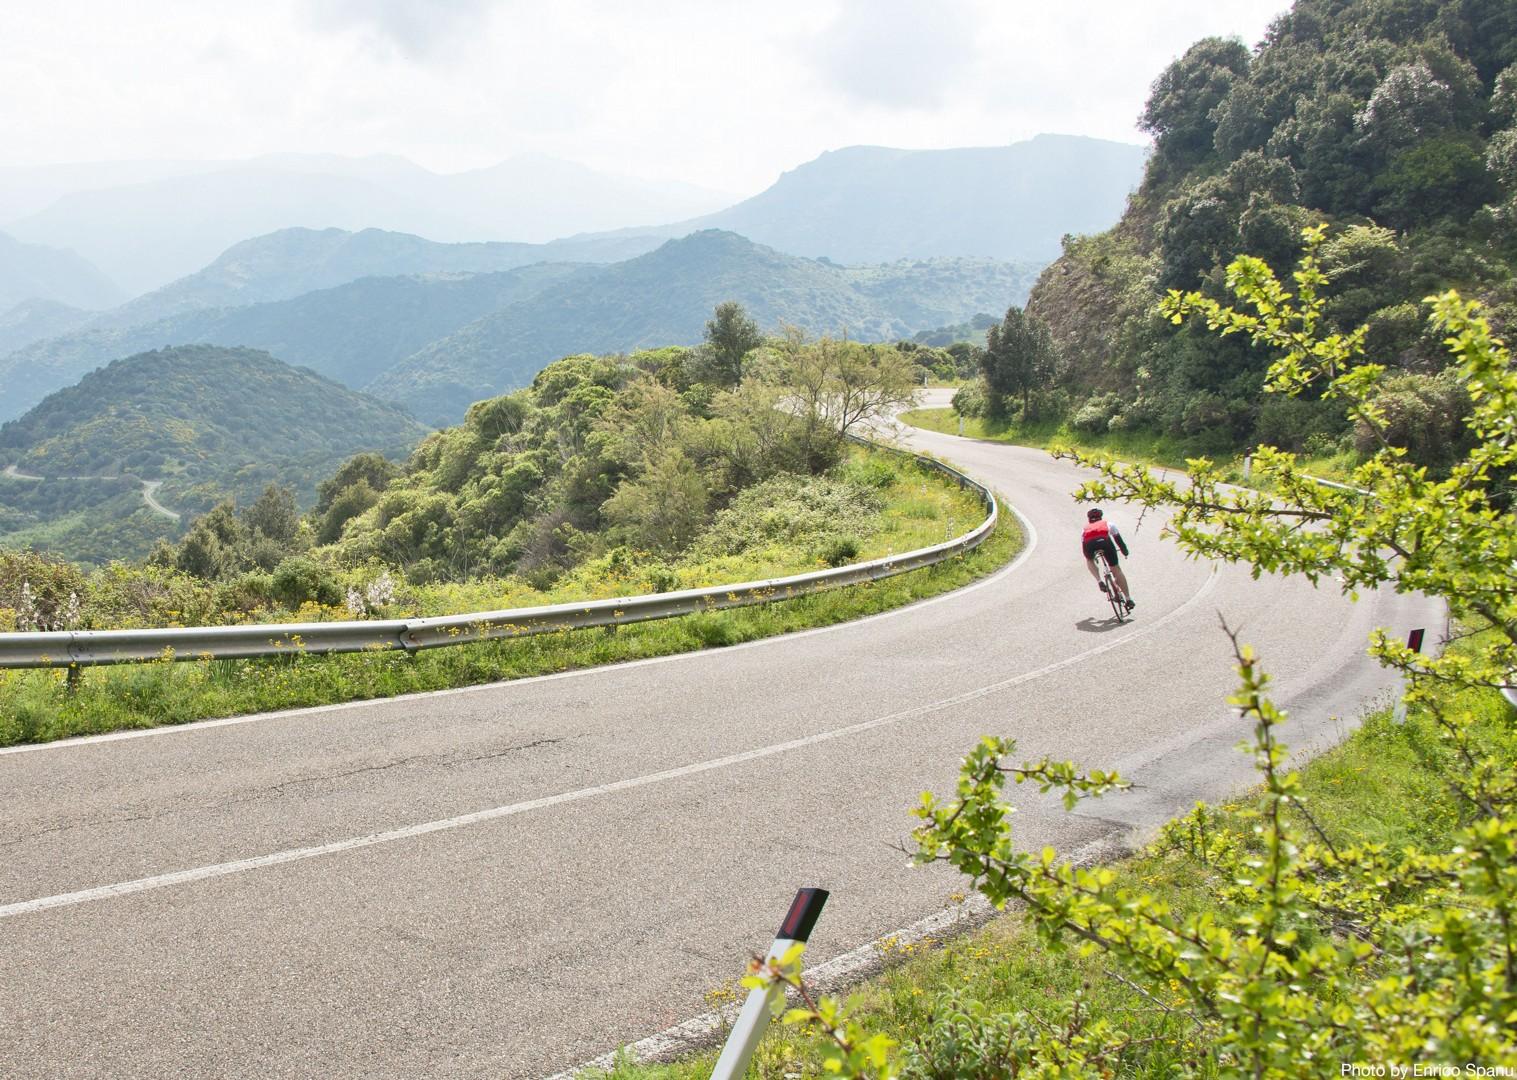 Road-Cycling-Holiday-Italy-Sardinia-Sardinian-Mountains.jpg - Italy - Sardinia - Mountain Explorer - Guided Road Cycling Holiday - Italia Road Cycling